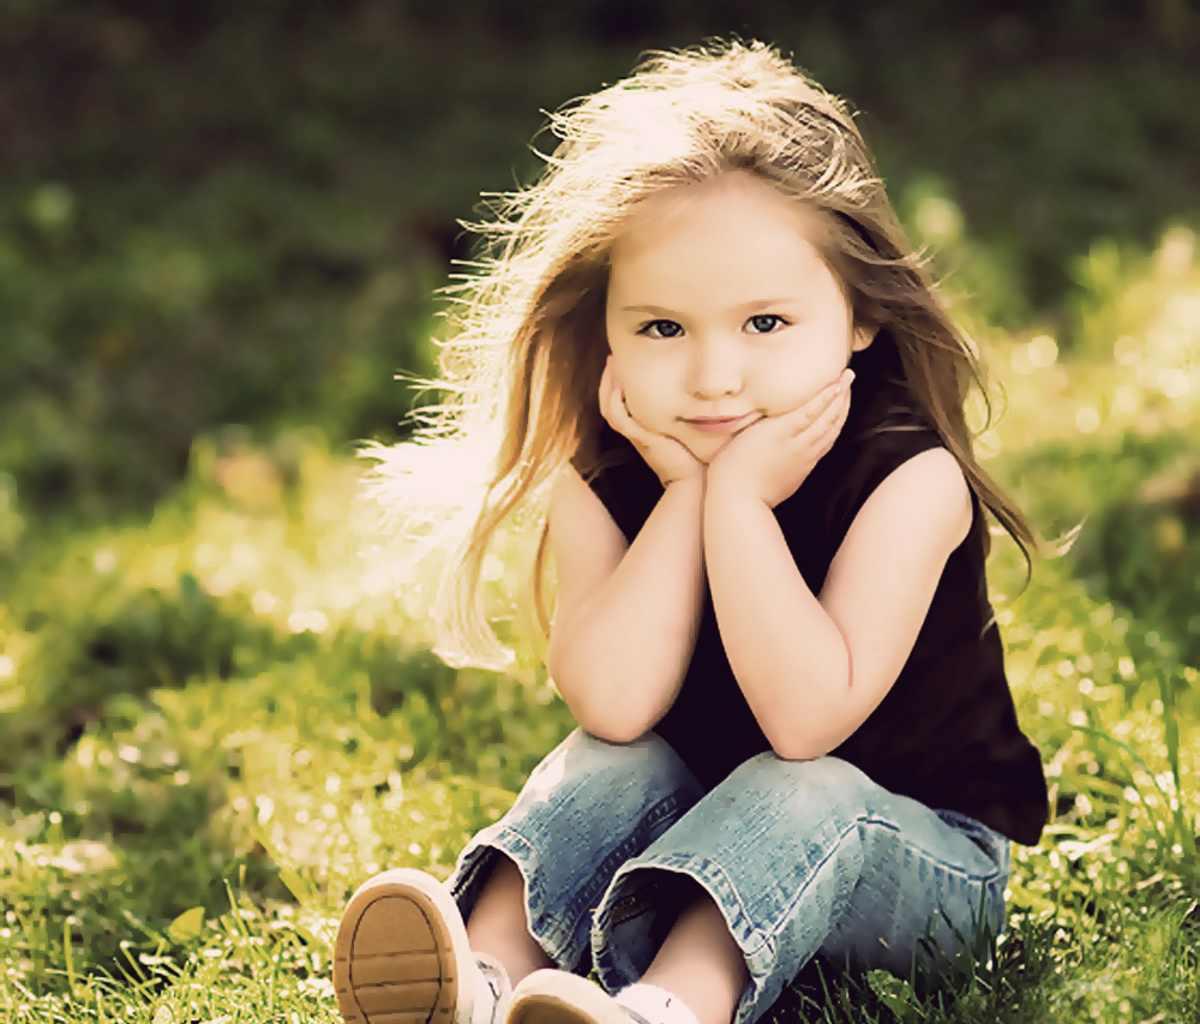 فتيات صغار كيوت قمرات